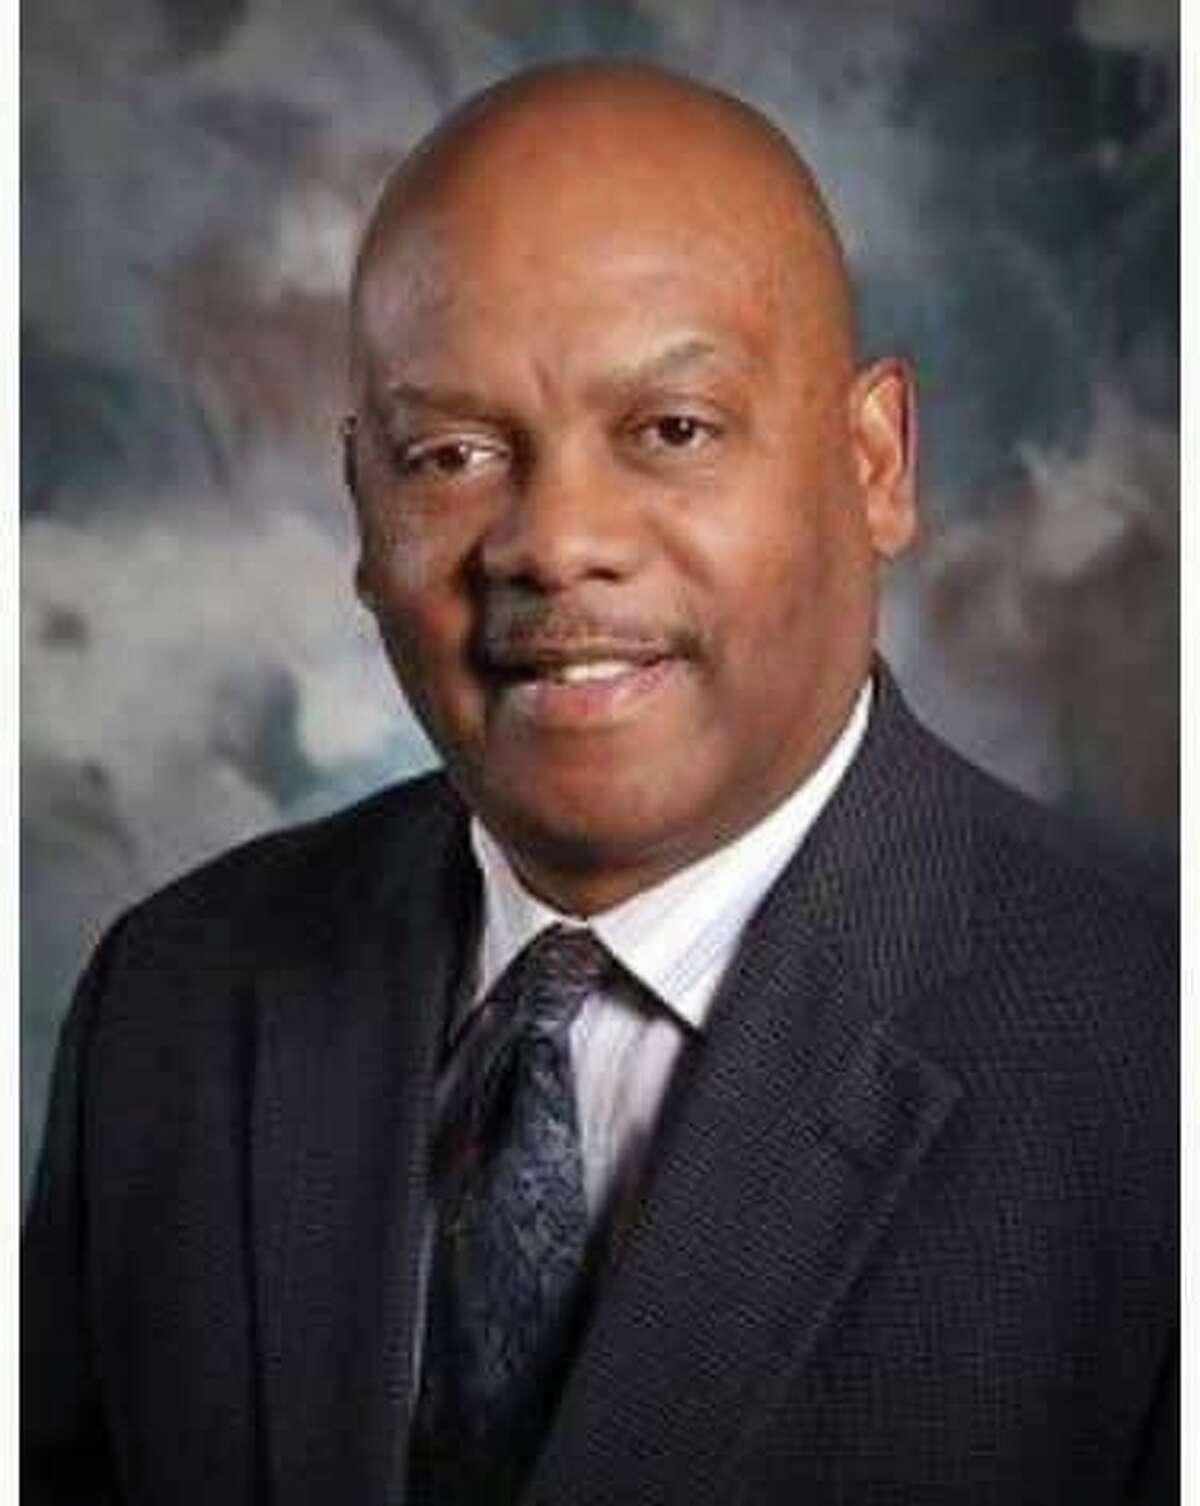 Middletown Common Council Deputy Majority Leader Grady Faulkner